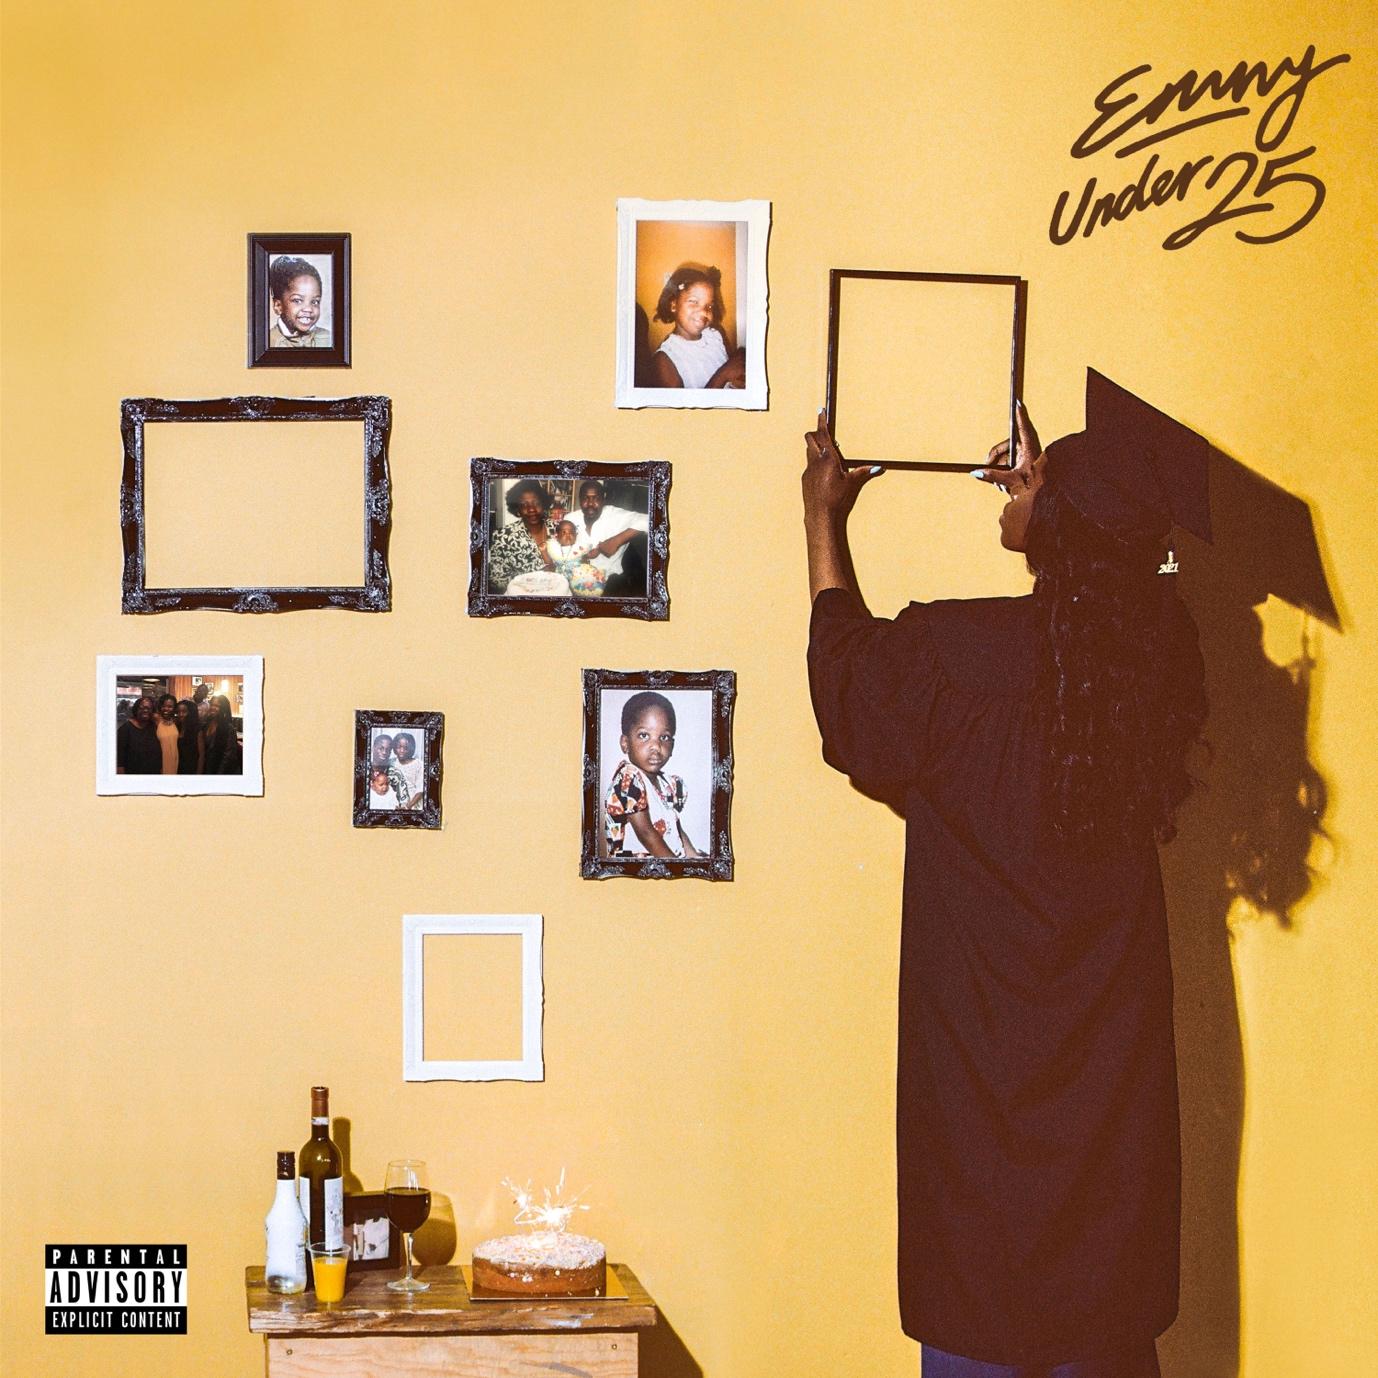 Enny Under 25